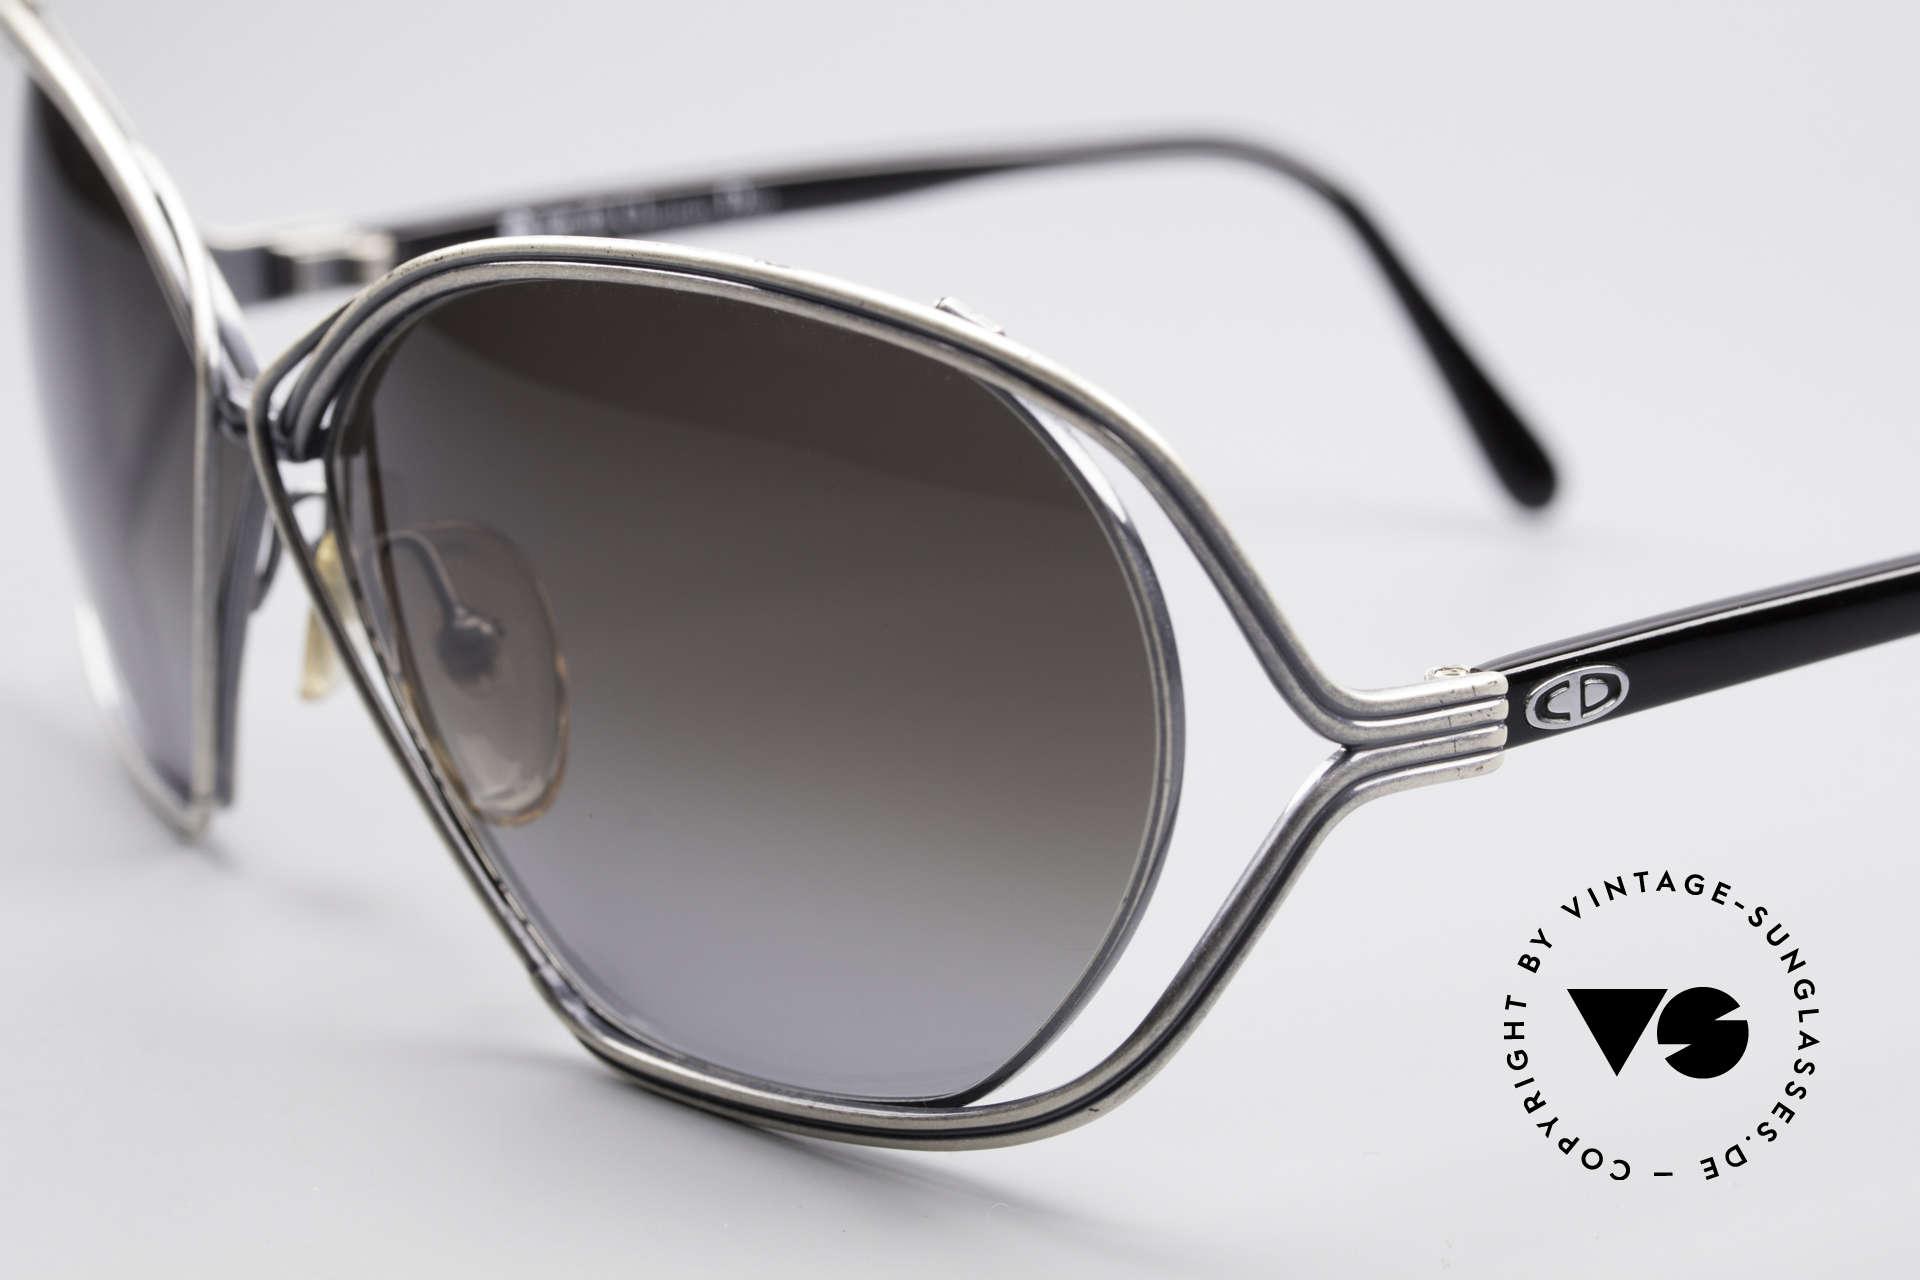 529b3757ce Sunglasses Christian Dior 2499 Ladies Sunglasses 80 s